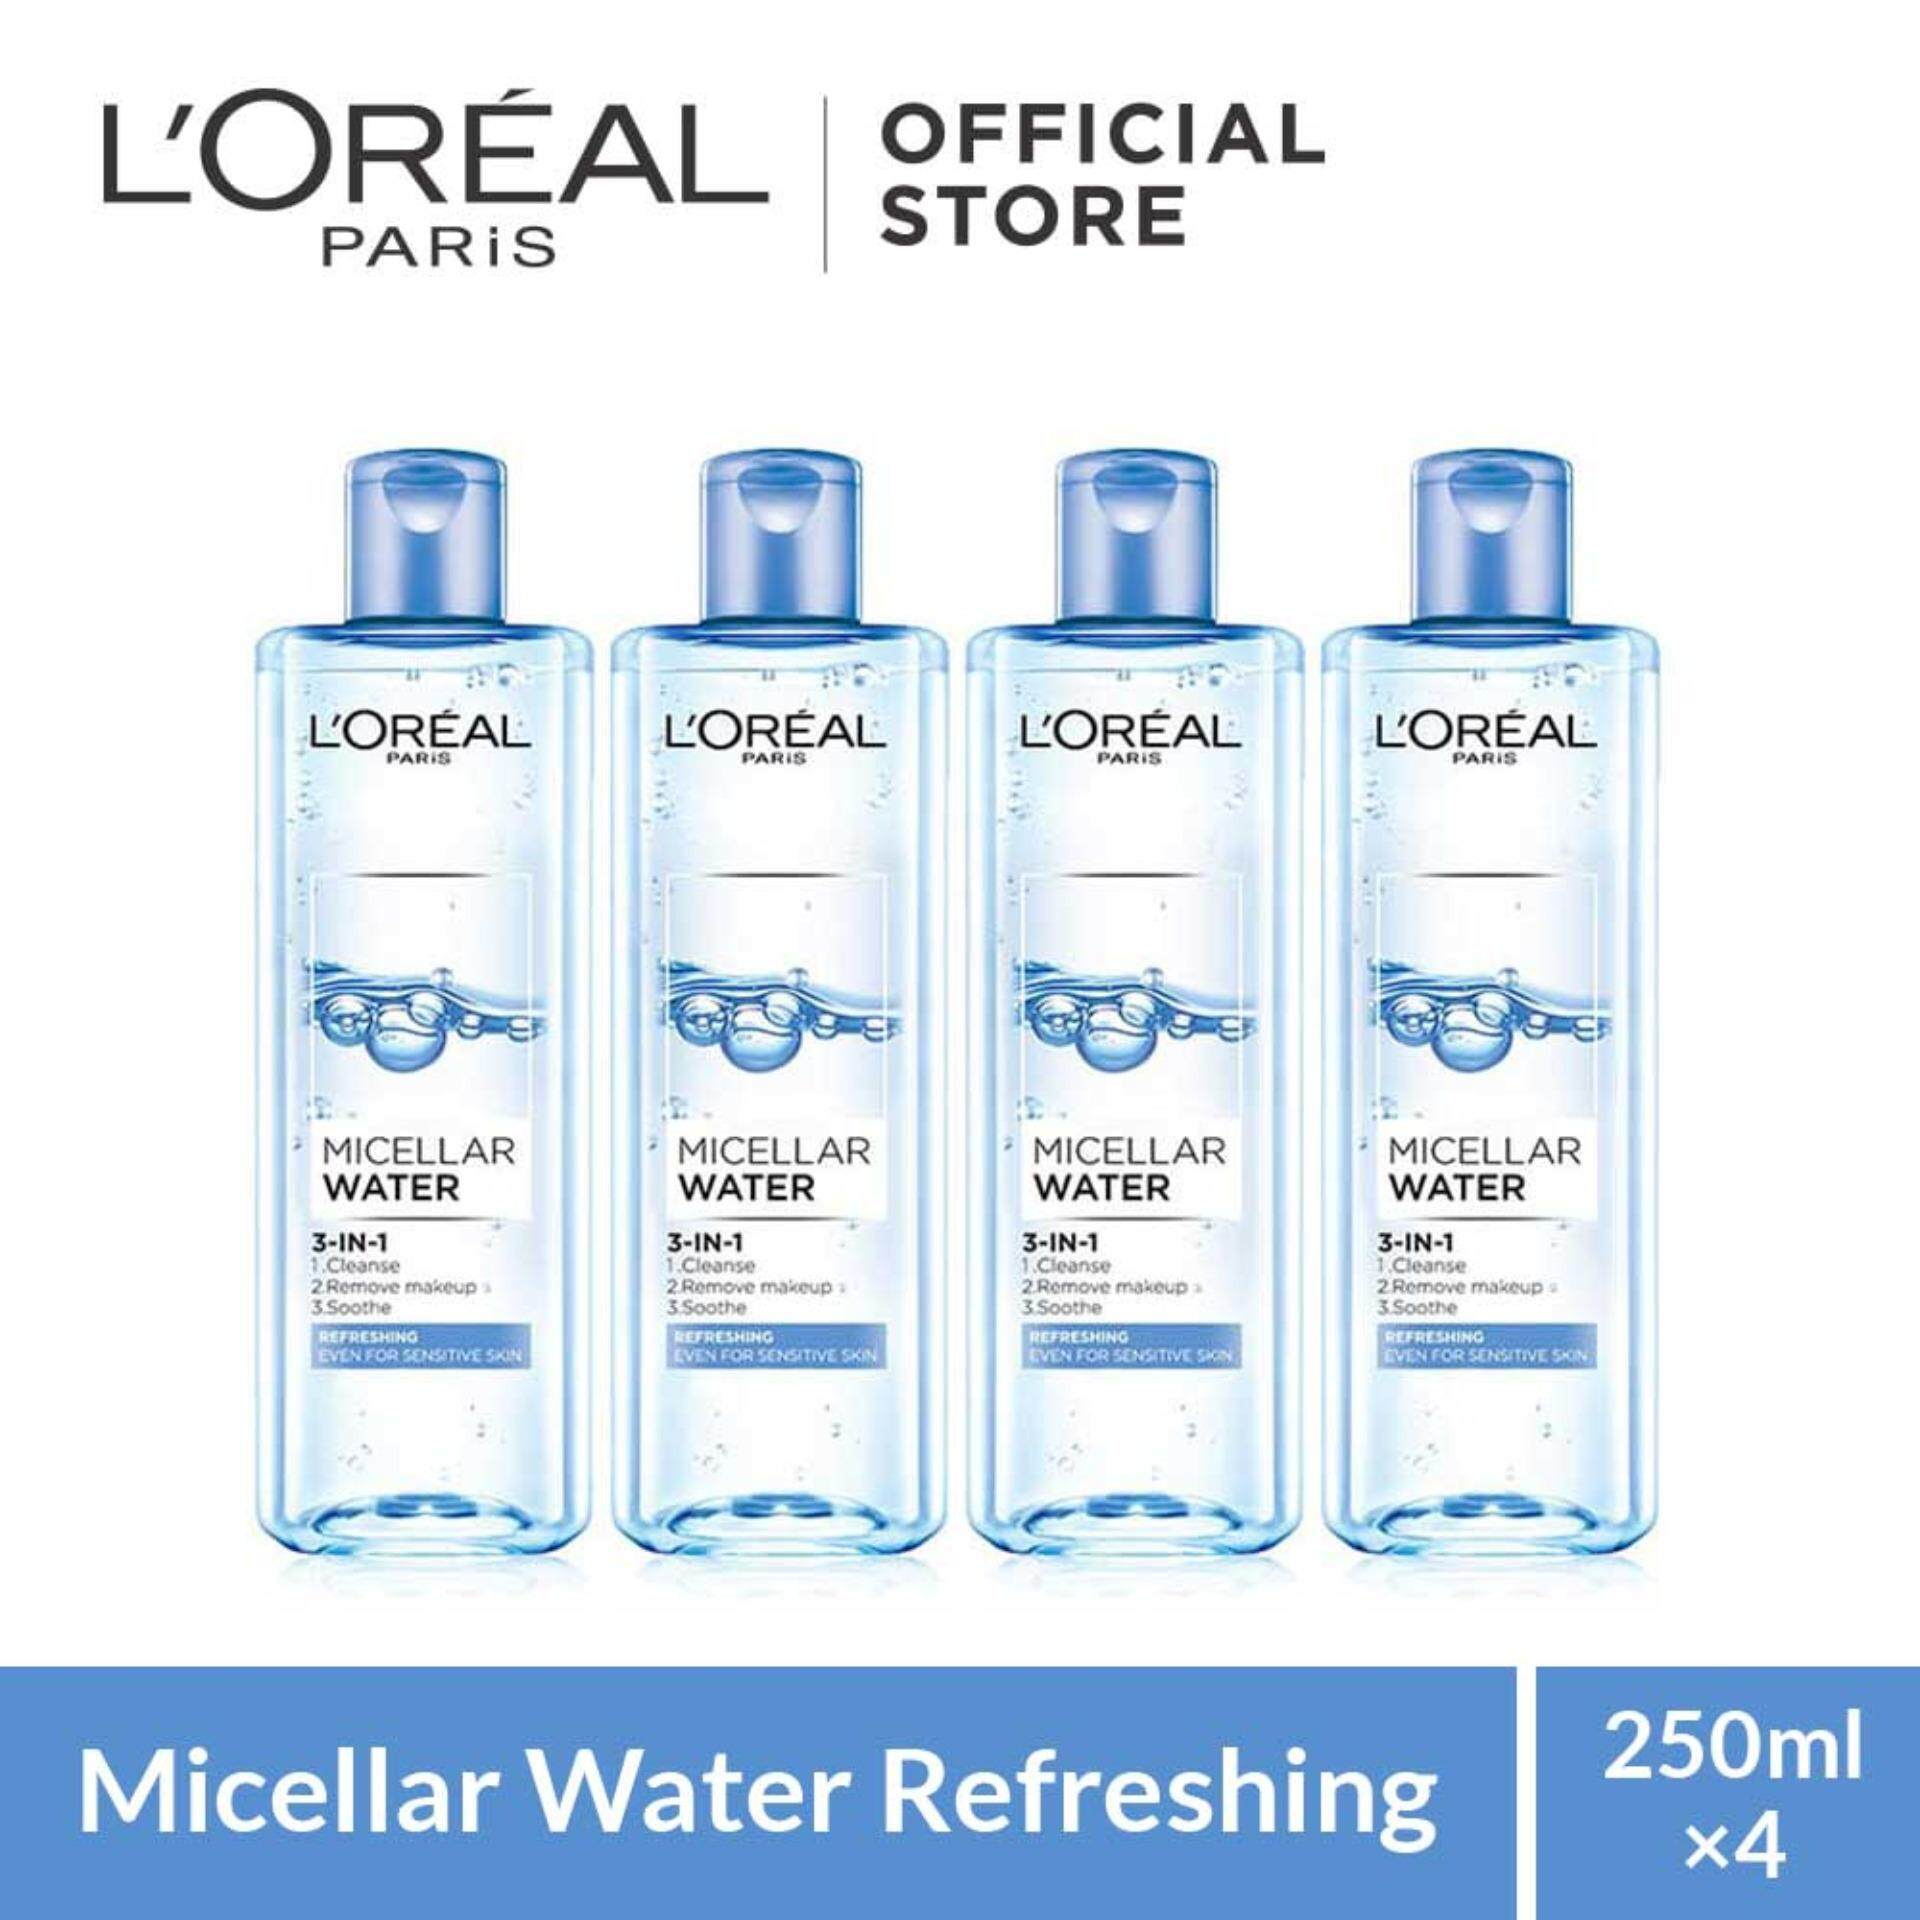 Makeup Brush Set Cosmetics With Best Price In Malaysia L Oreal Micellar Water 250ml Blue Loreal Paris Refreshing